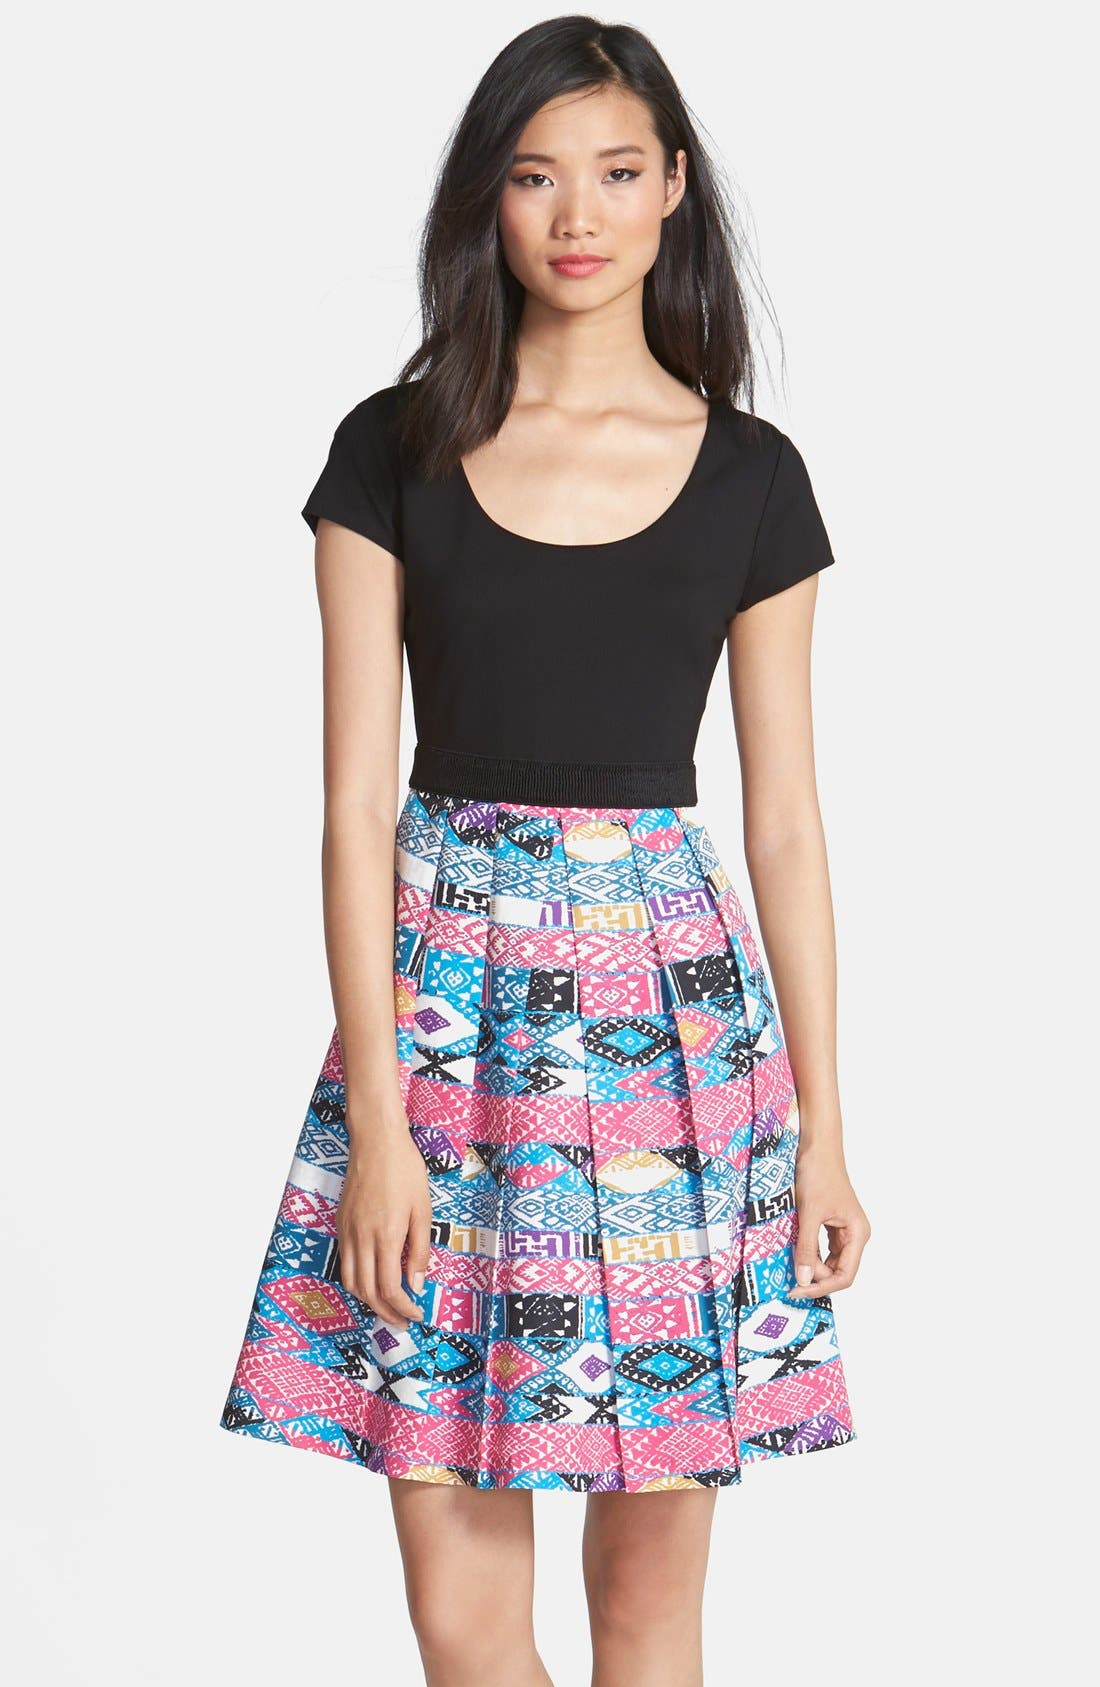 Main Image - Plenty by Tracy Reese 'Zoe' Print Skirt Fit & Flare Dress